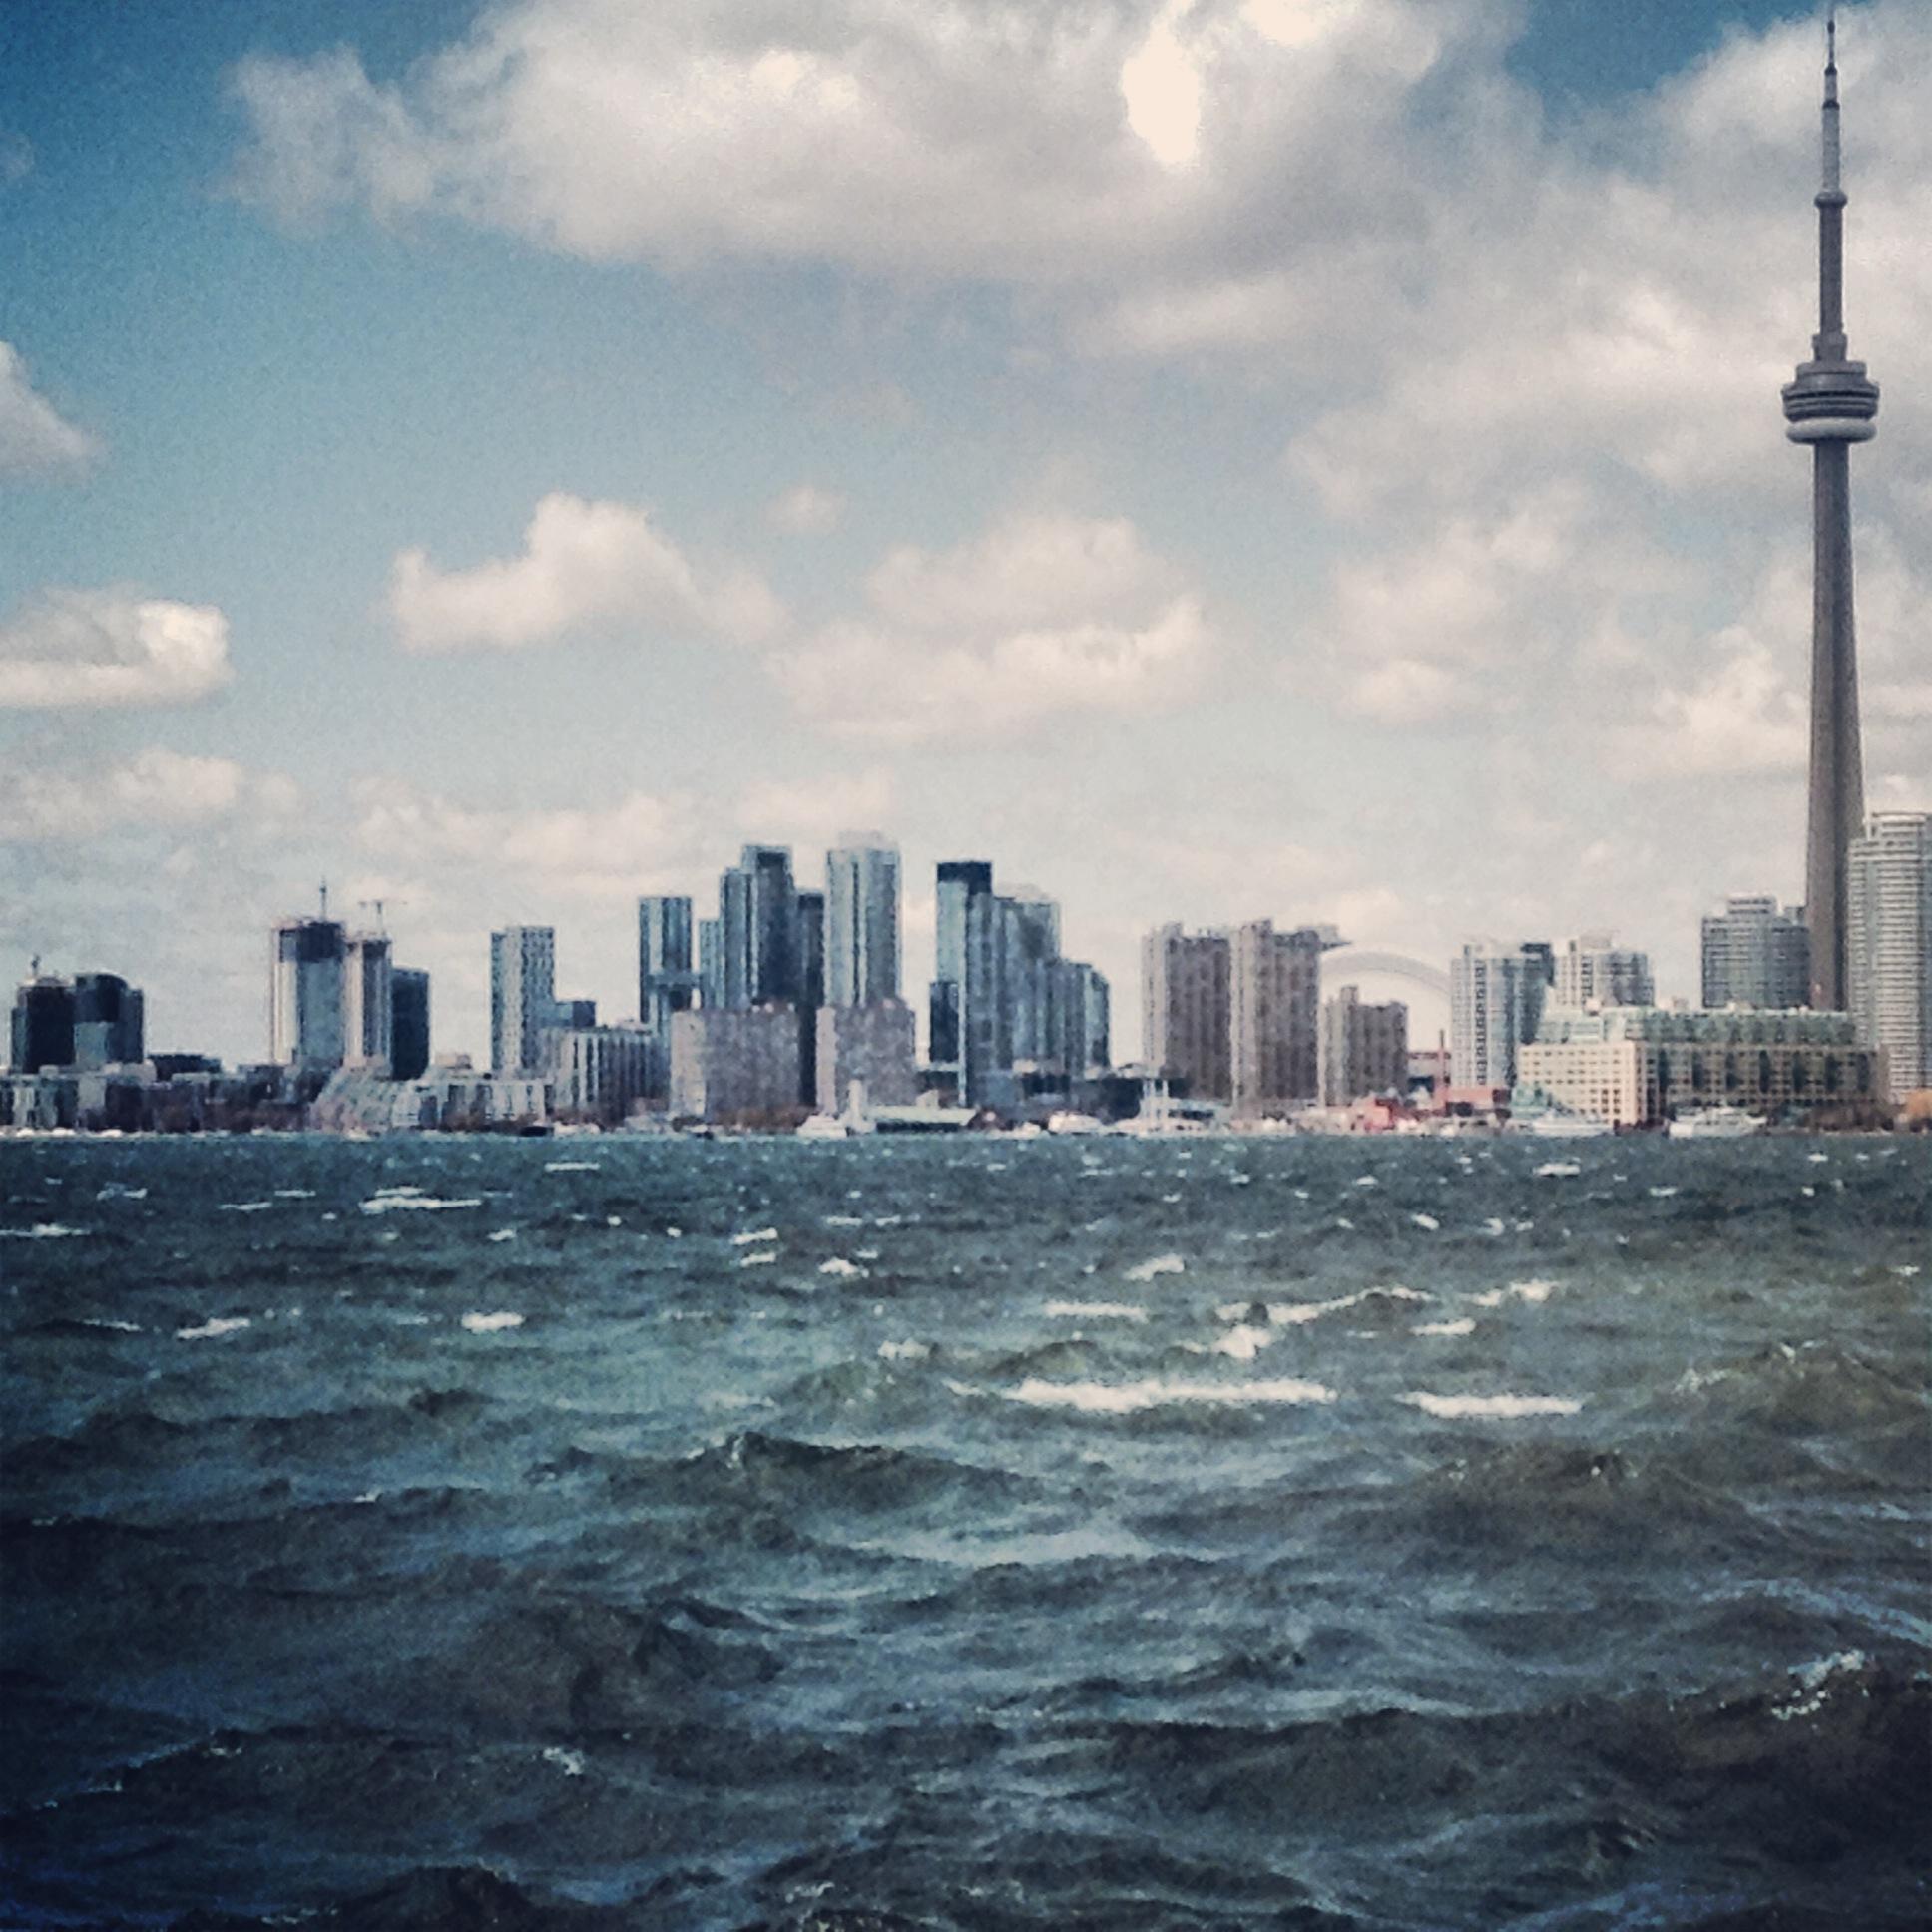 Toronto from Toronto Island.